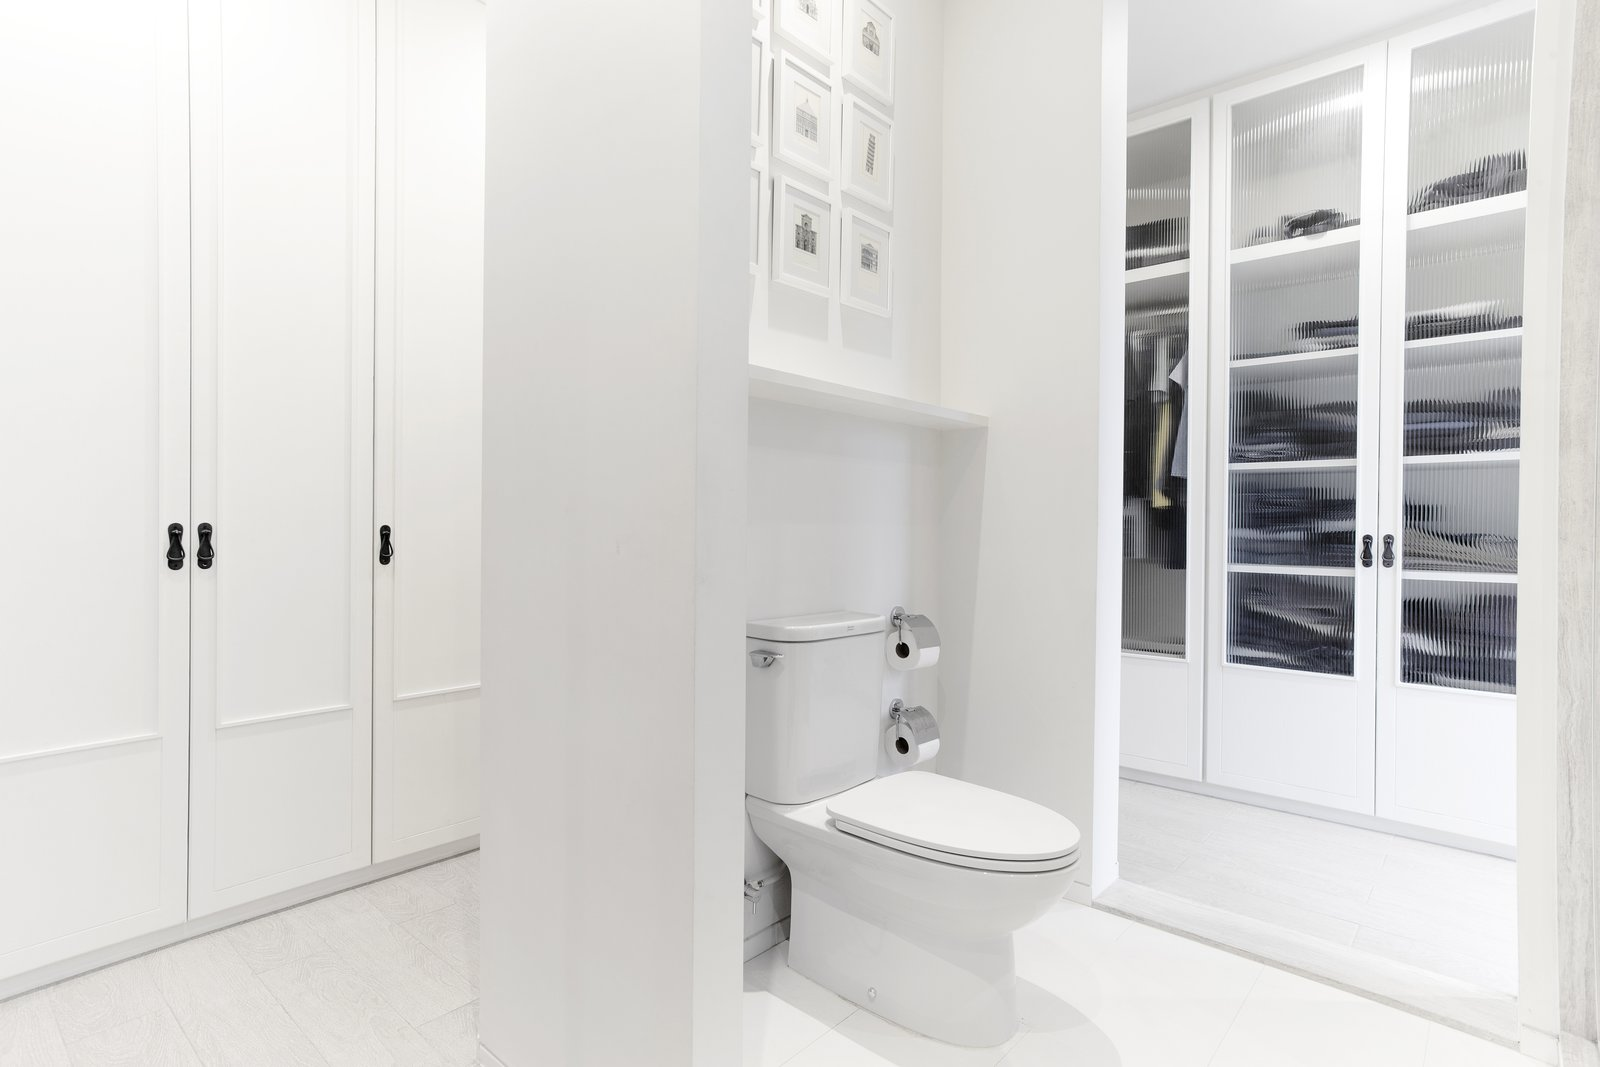 Bath Room, Porcelain Tile Floor, and Two Piece Toilet  Huamark 09